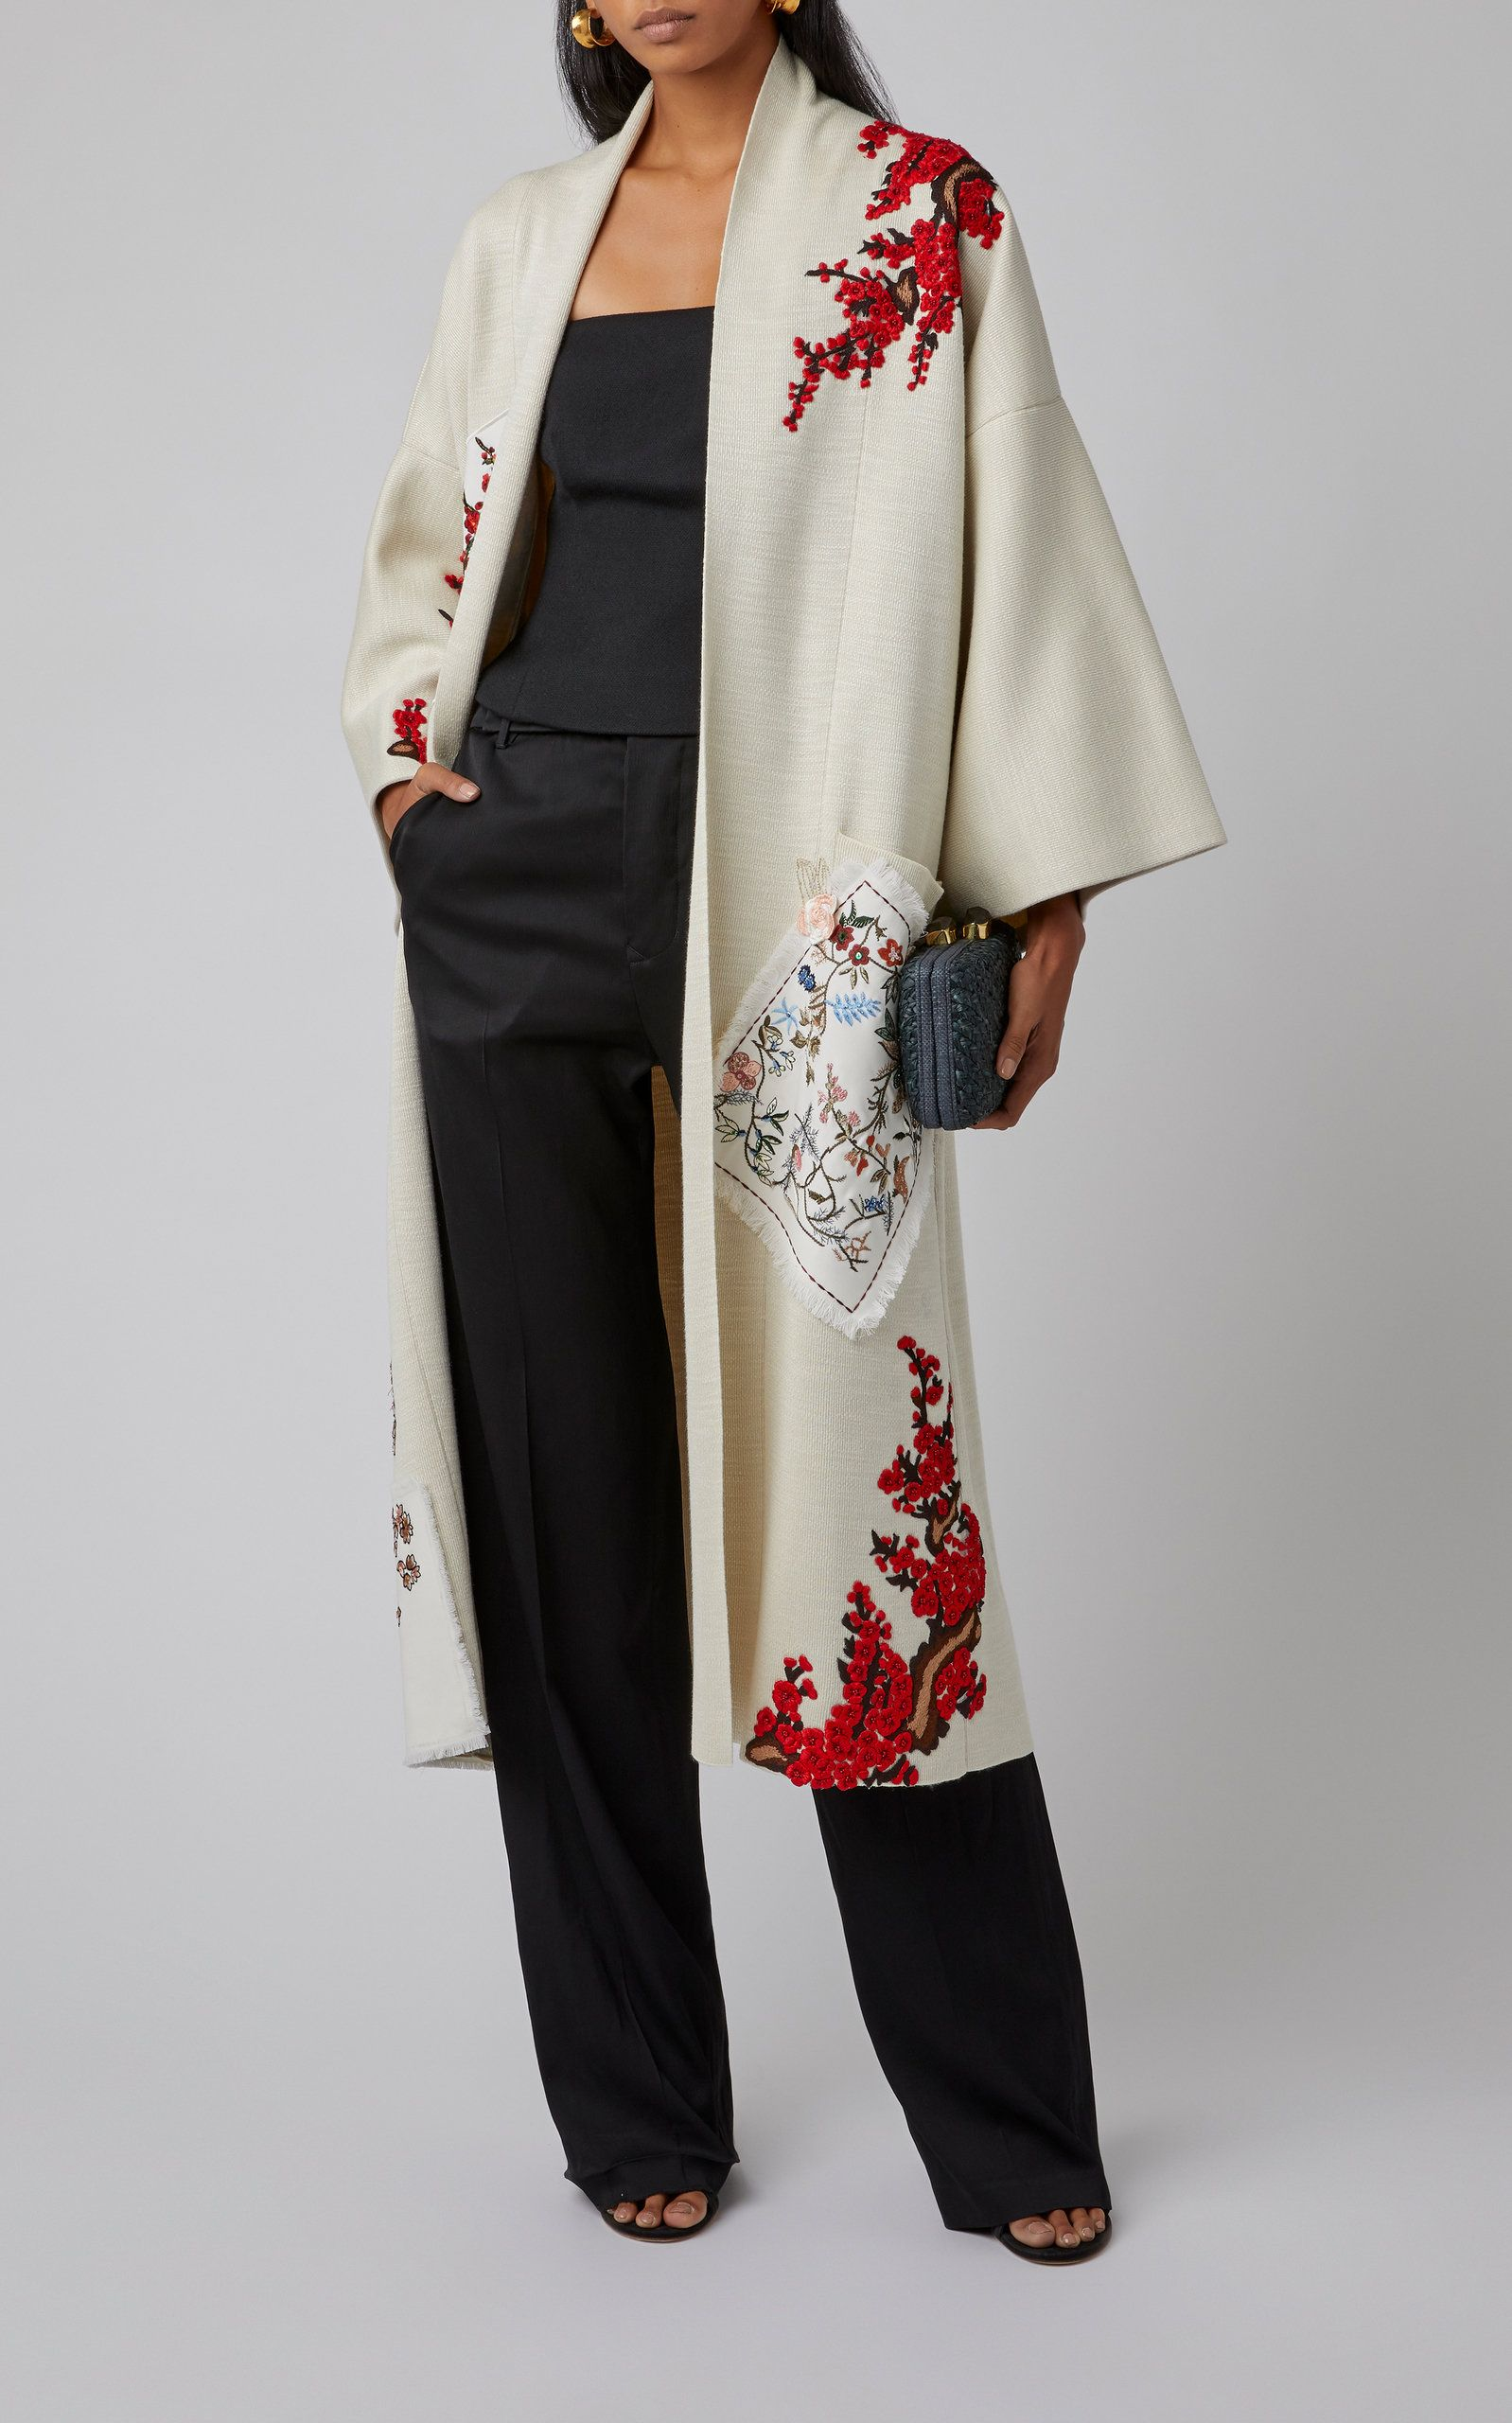 Oscar De La Renta Fashion Collections For Women | Moda Operandi